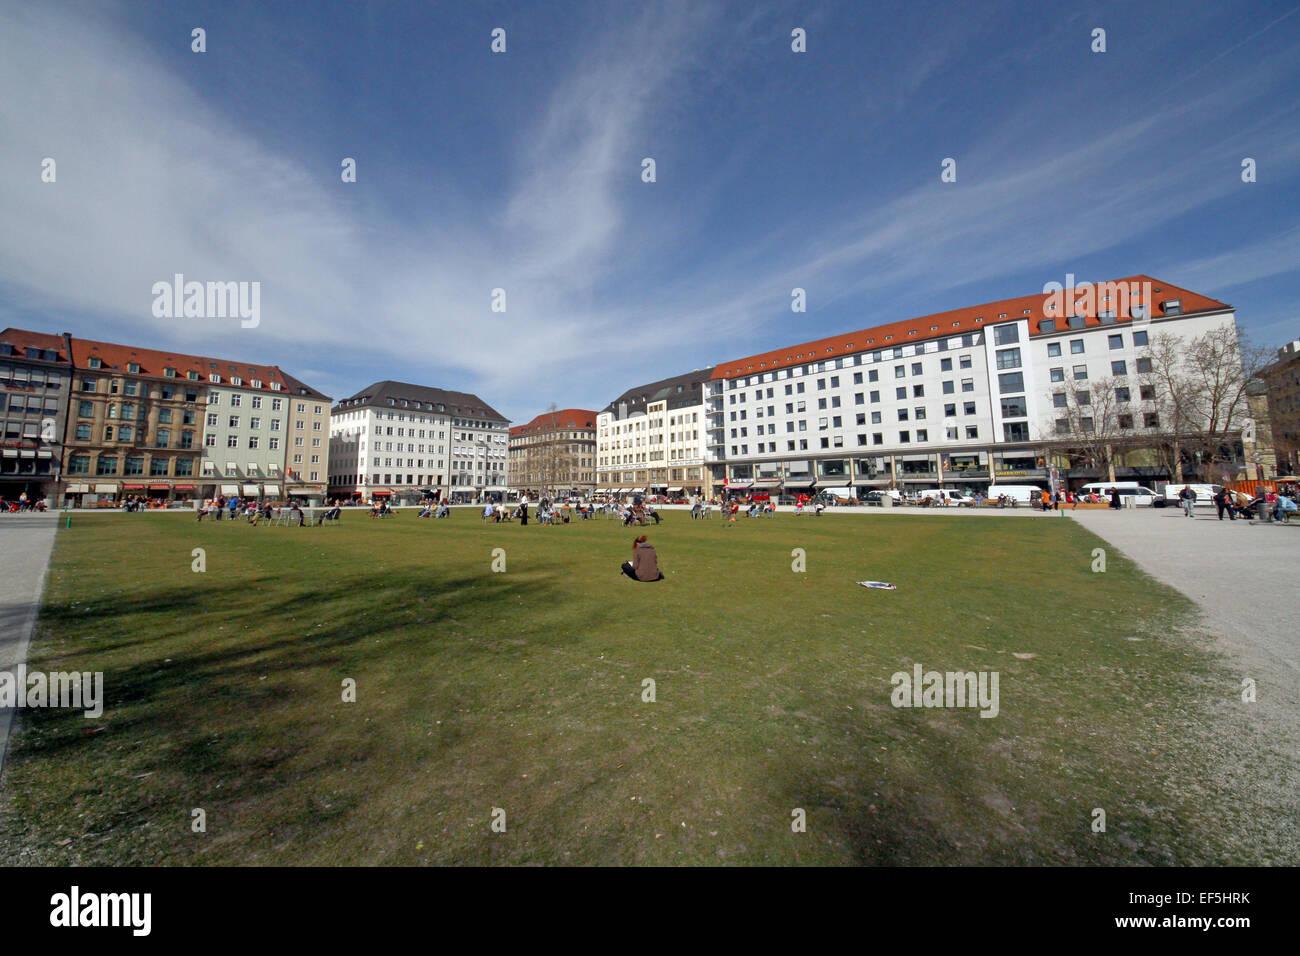 GRASS AREA & BUILDINGS MARIENHOF MUNICH GERMANY 18 March 2014 - Stock Image